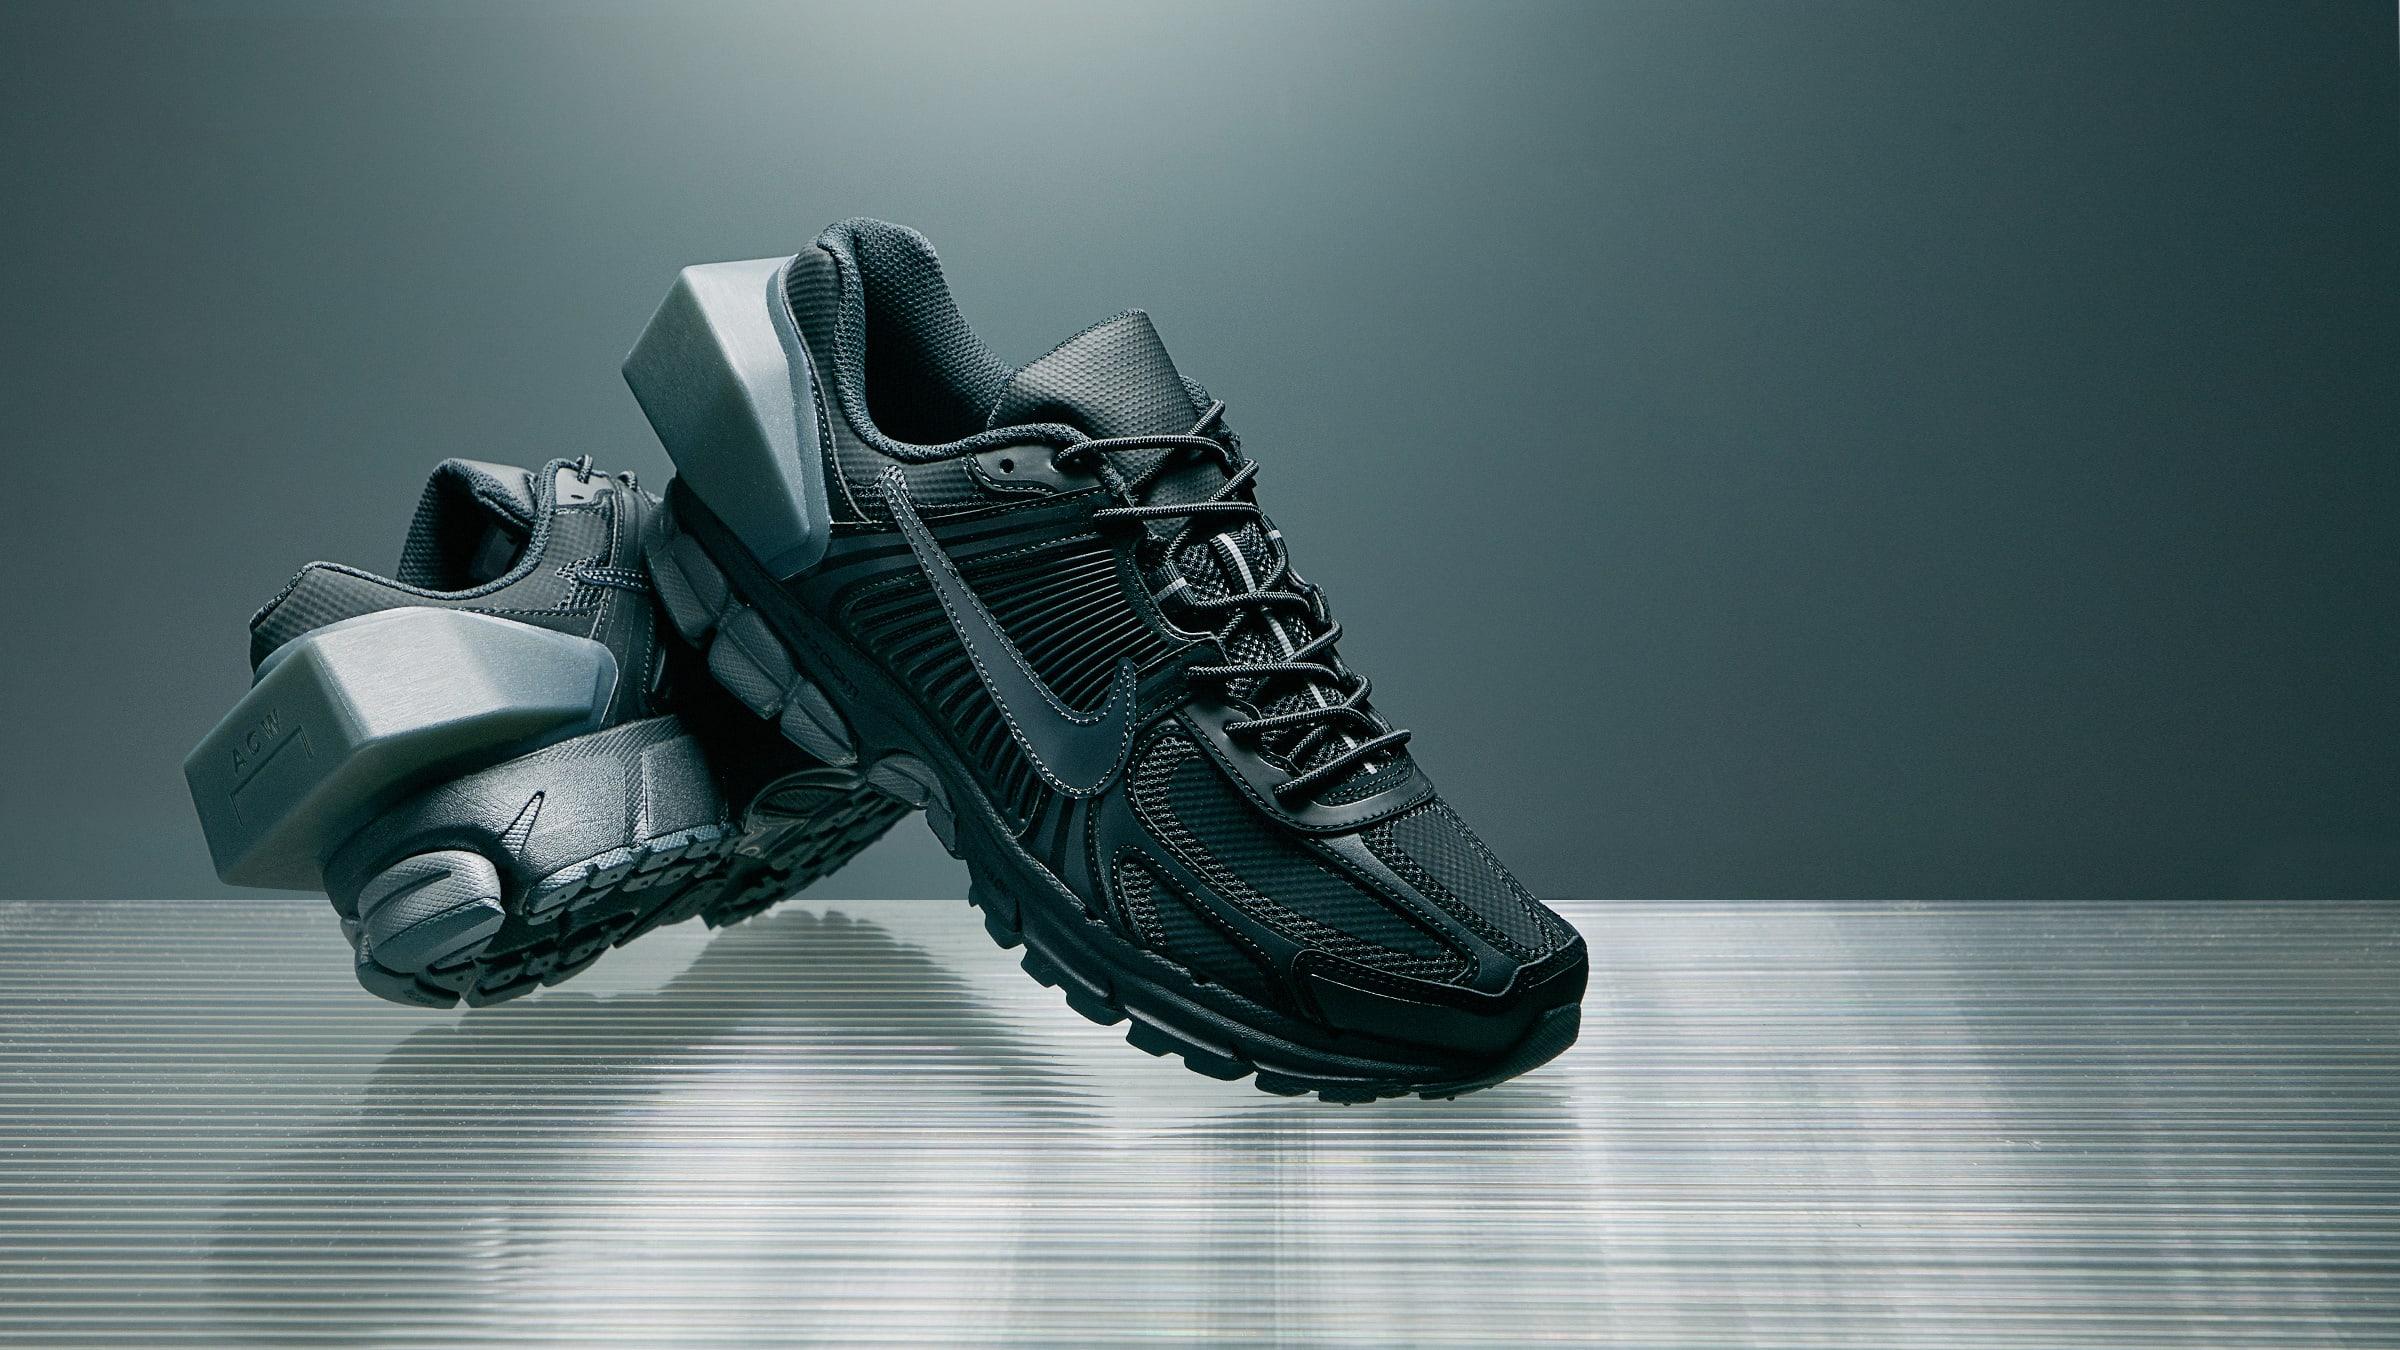 2806b2e843e czech nike nike womens air zoom vomero 11 running shoe 5d10b 6bb26  coupon  code for samuel ross hotly anticipated sneaker pack with nike arrives b1baa  e0095